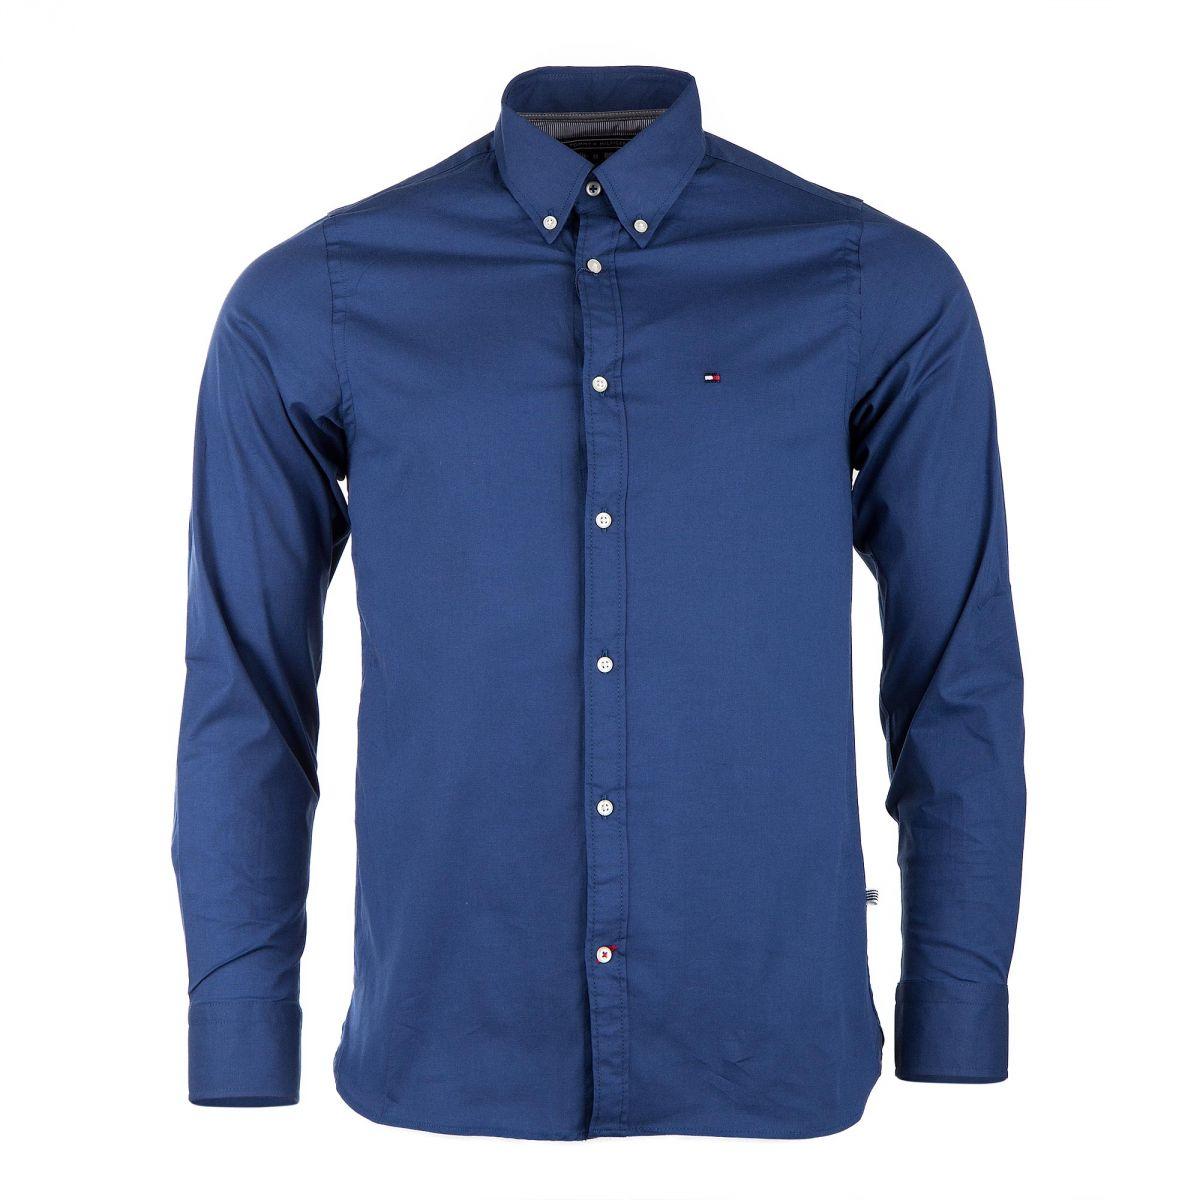 chemise manches longues bleu roi homme tommy hilfiger. Black Bedroom Furniture Sets. Home Design Ideas